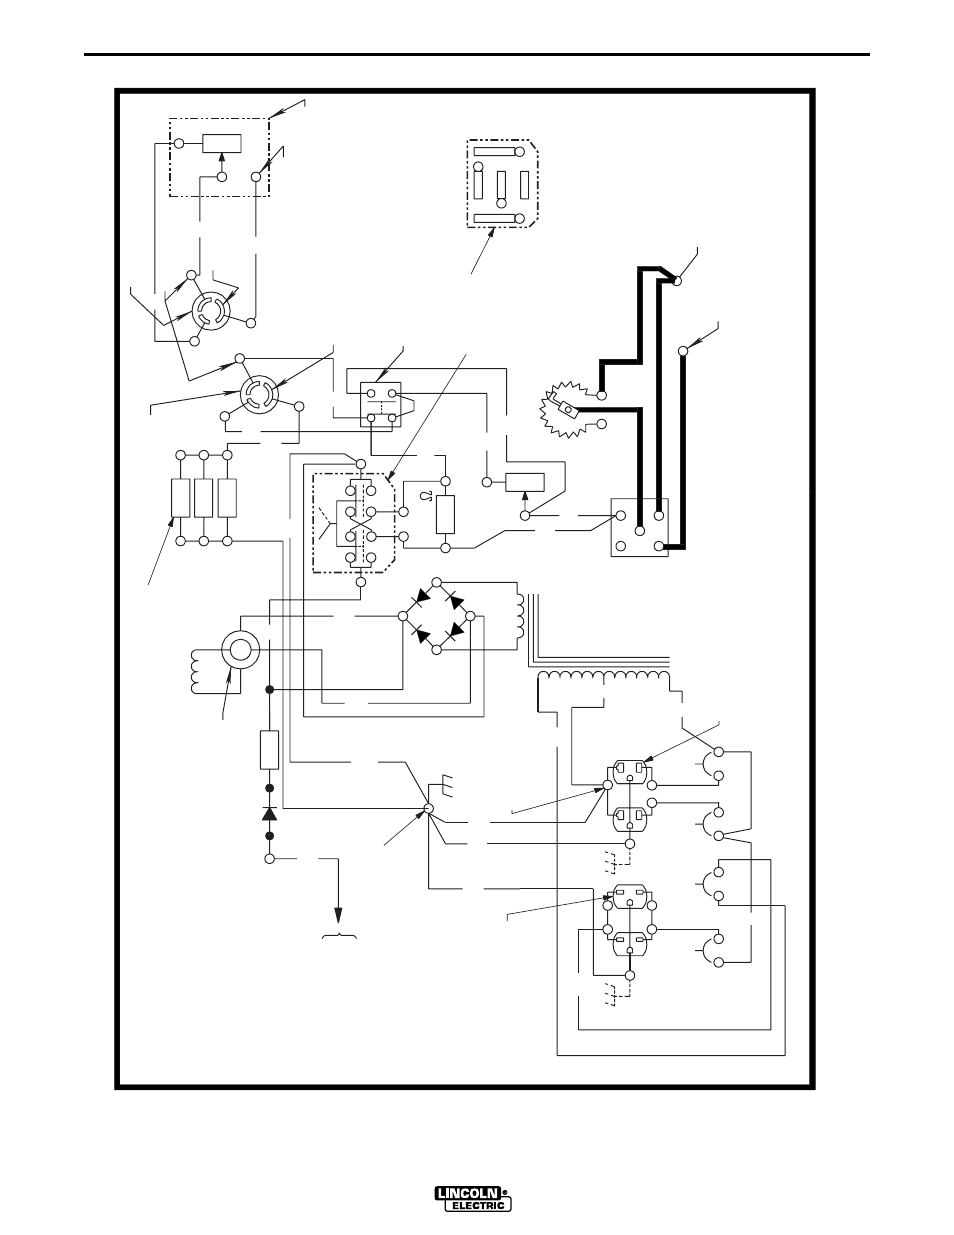 100 Lincoln Ac 225 Welder Wiring Diagram For Generator – Lincoln 225 Arc Welder Wiring Diagram